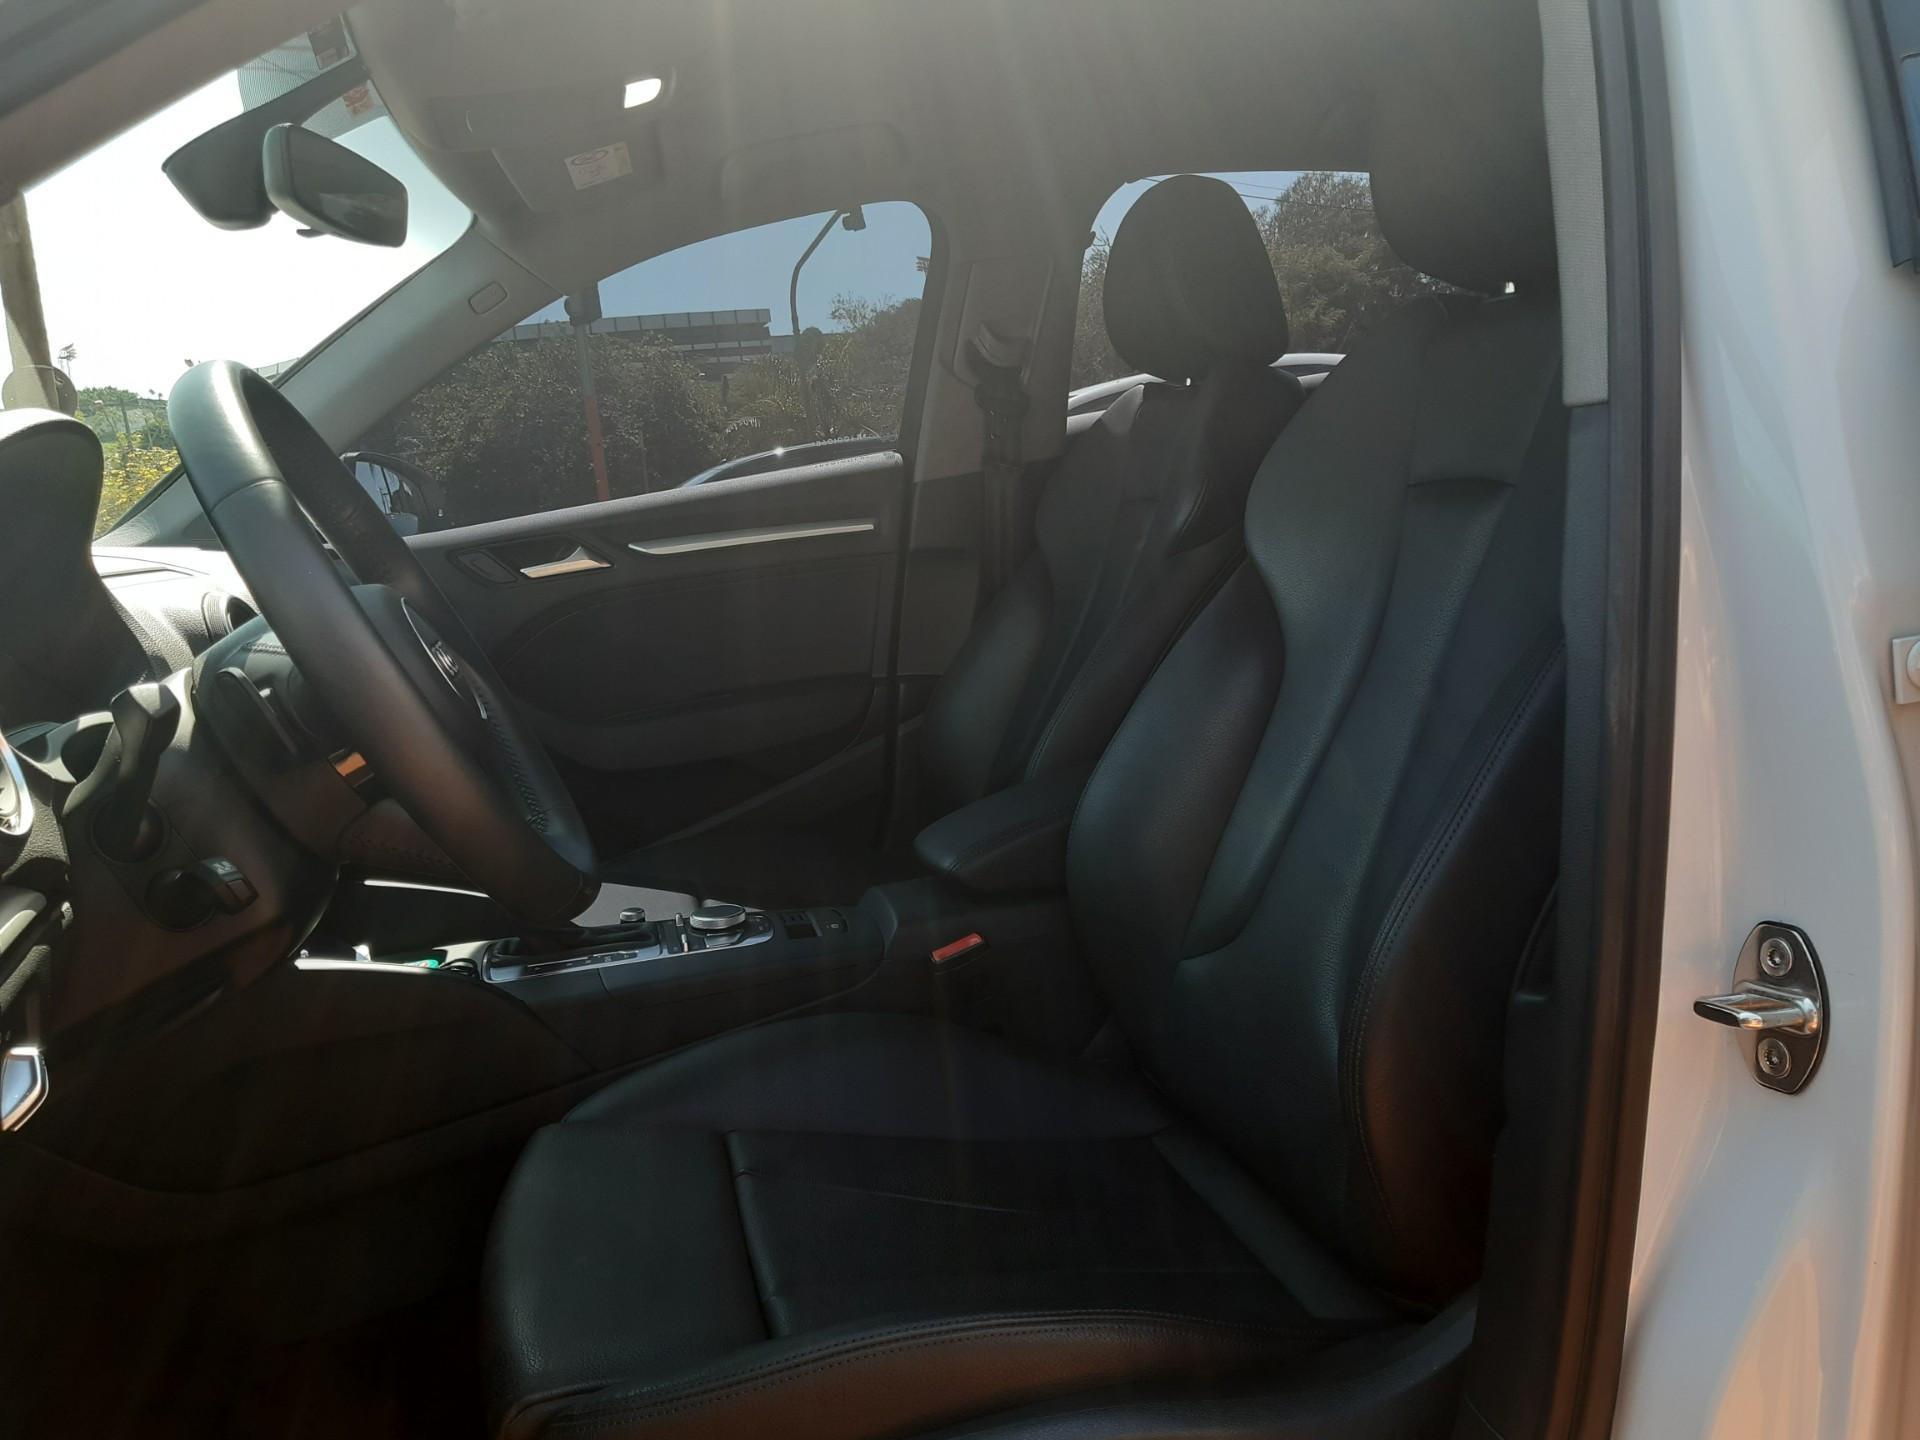 AUDI A3 Sedan 1.4 16V 4P FLEX TFSI PRESTIGE PLUS AUTOMÁTICO, Foto 5